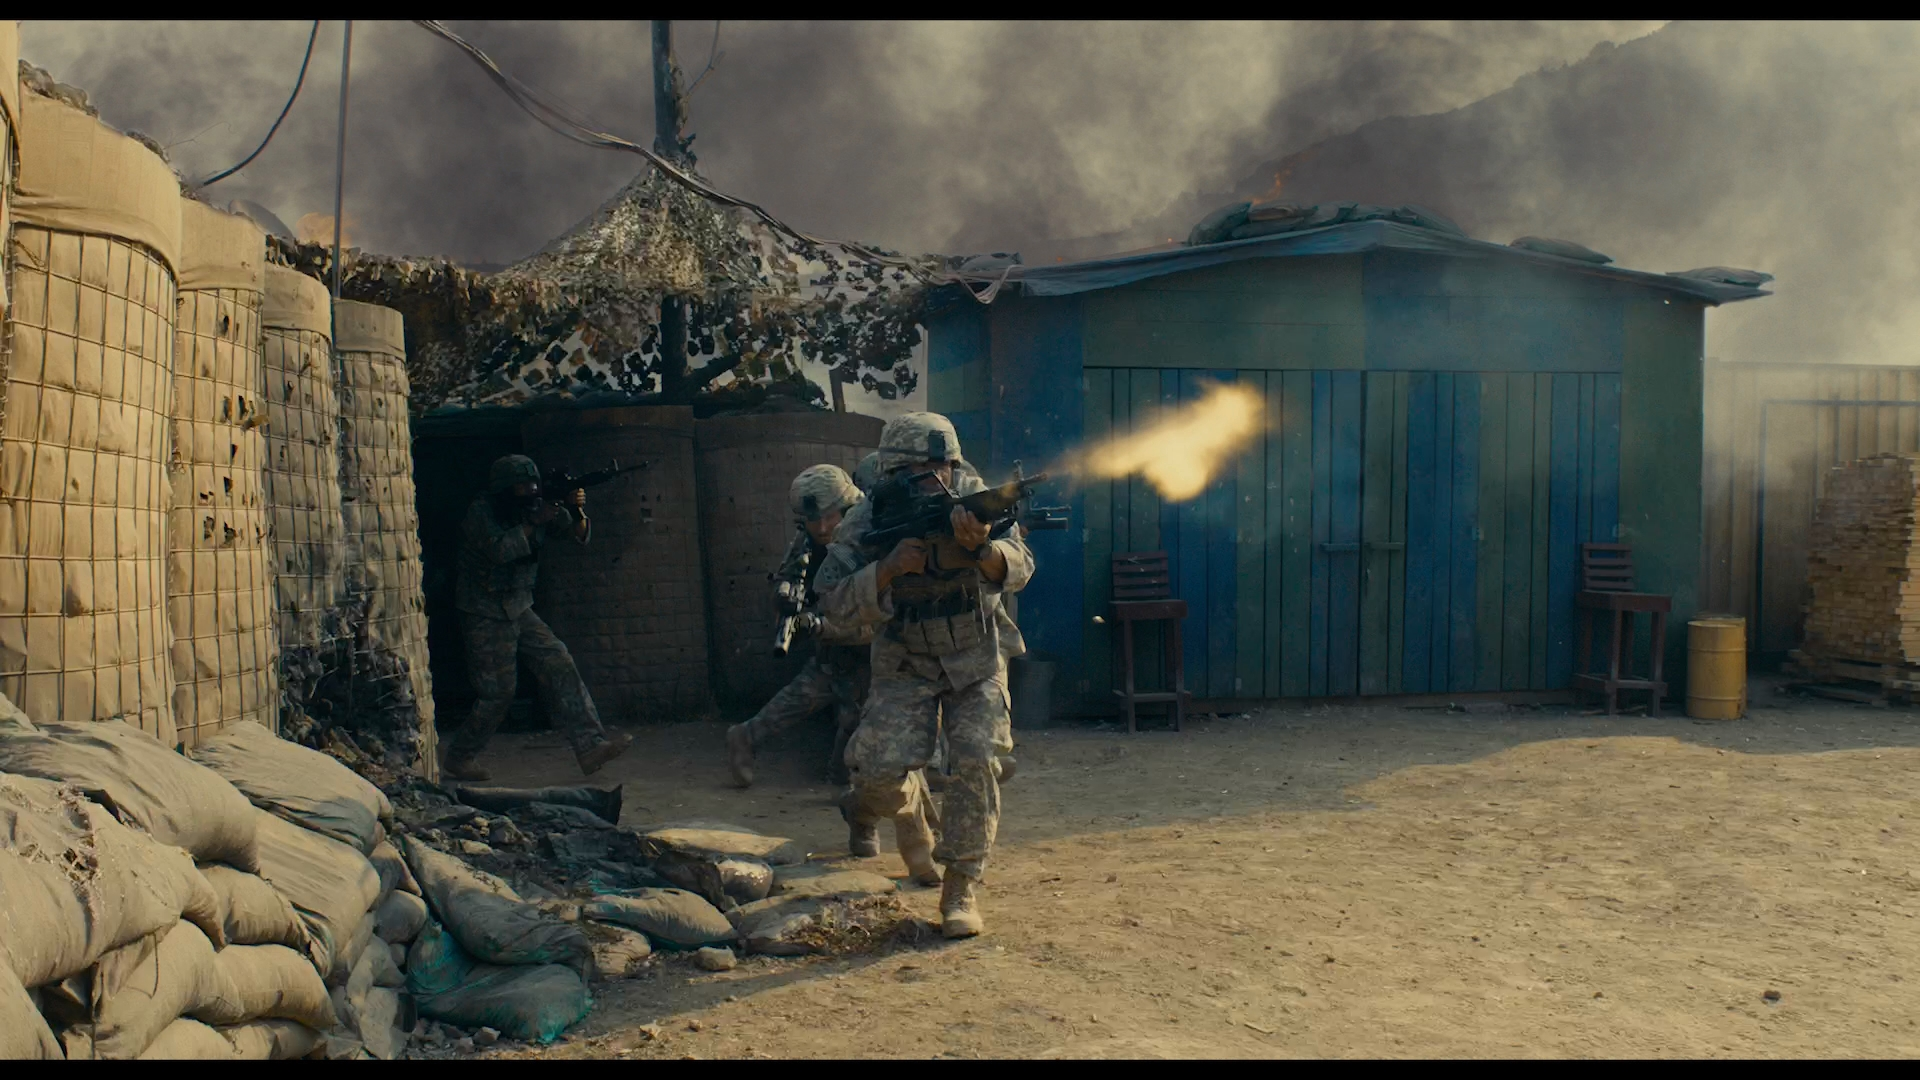 La Batalla de Kamdesh (2020) 1080p BDRip Latino